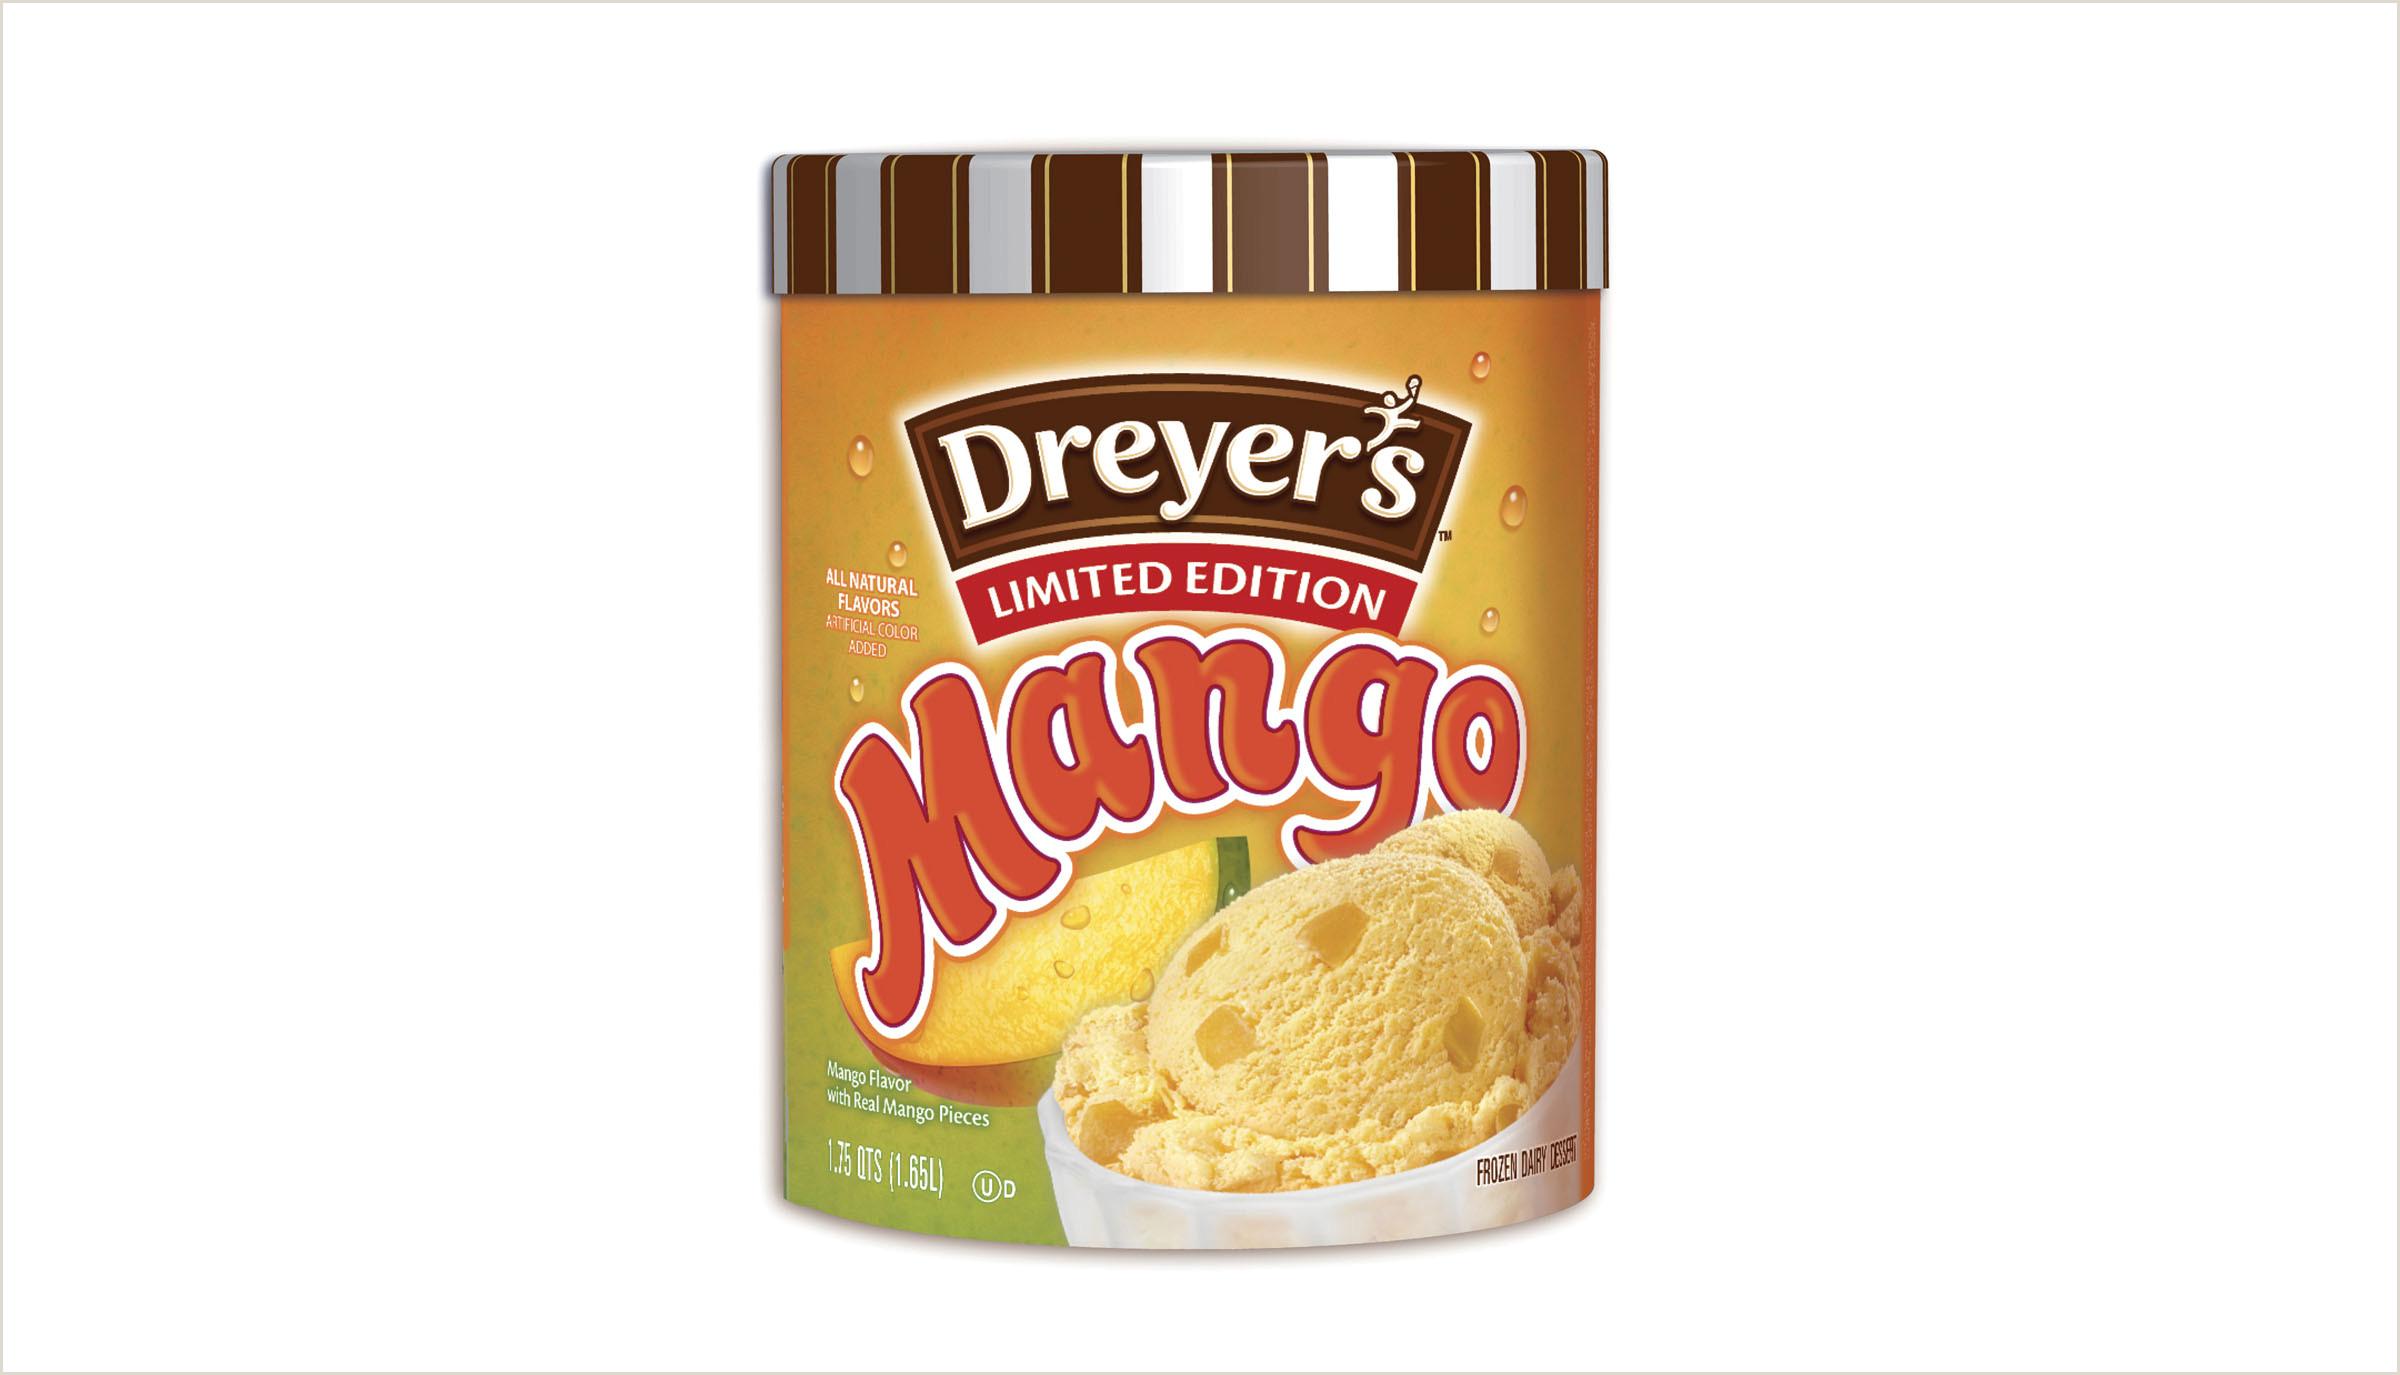 Ice Cream Packaging Template Urbanglyph Greg Kaats